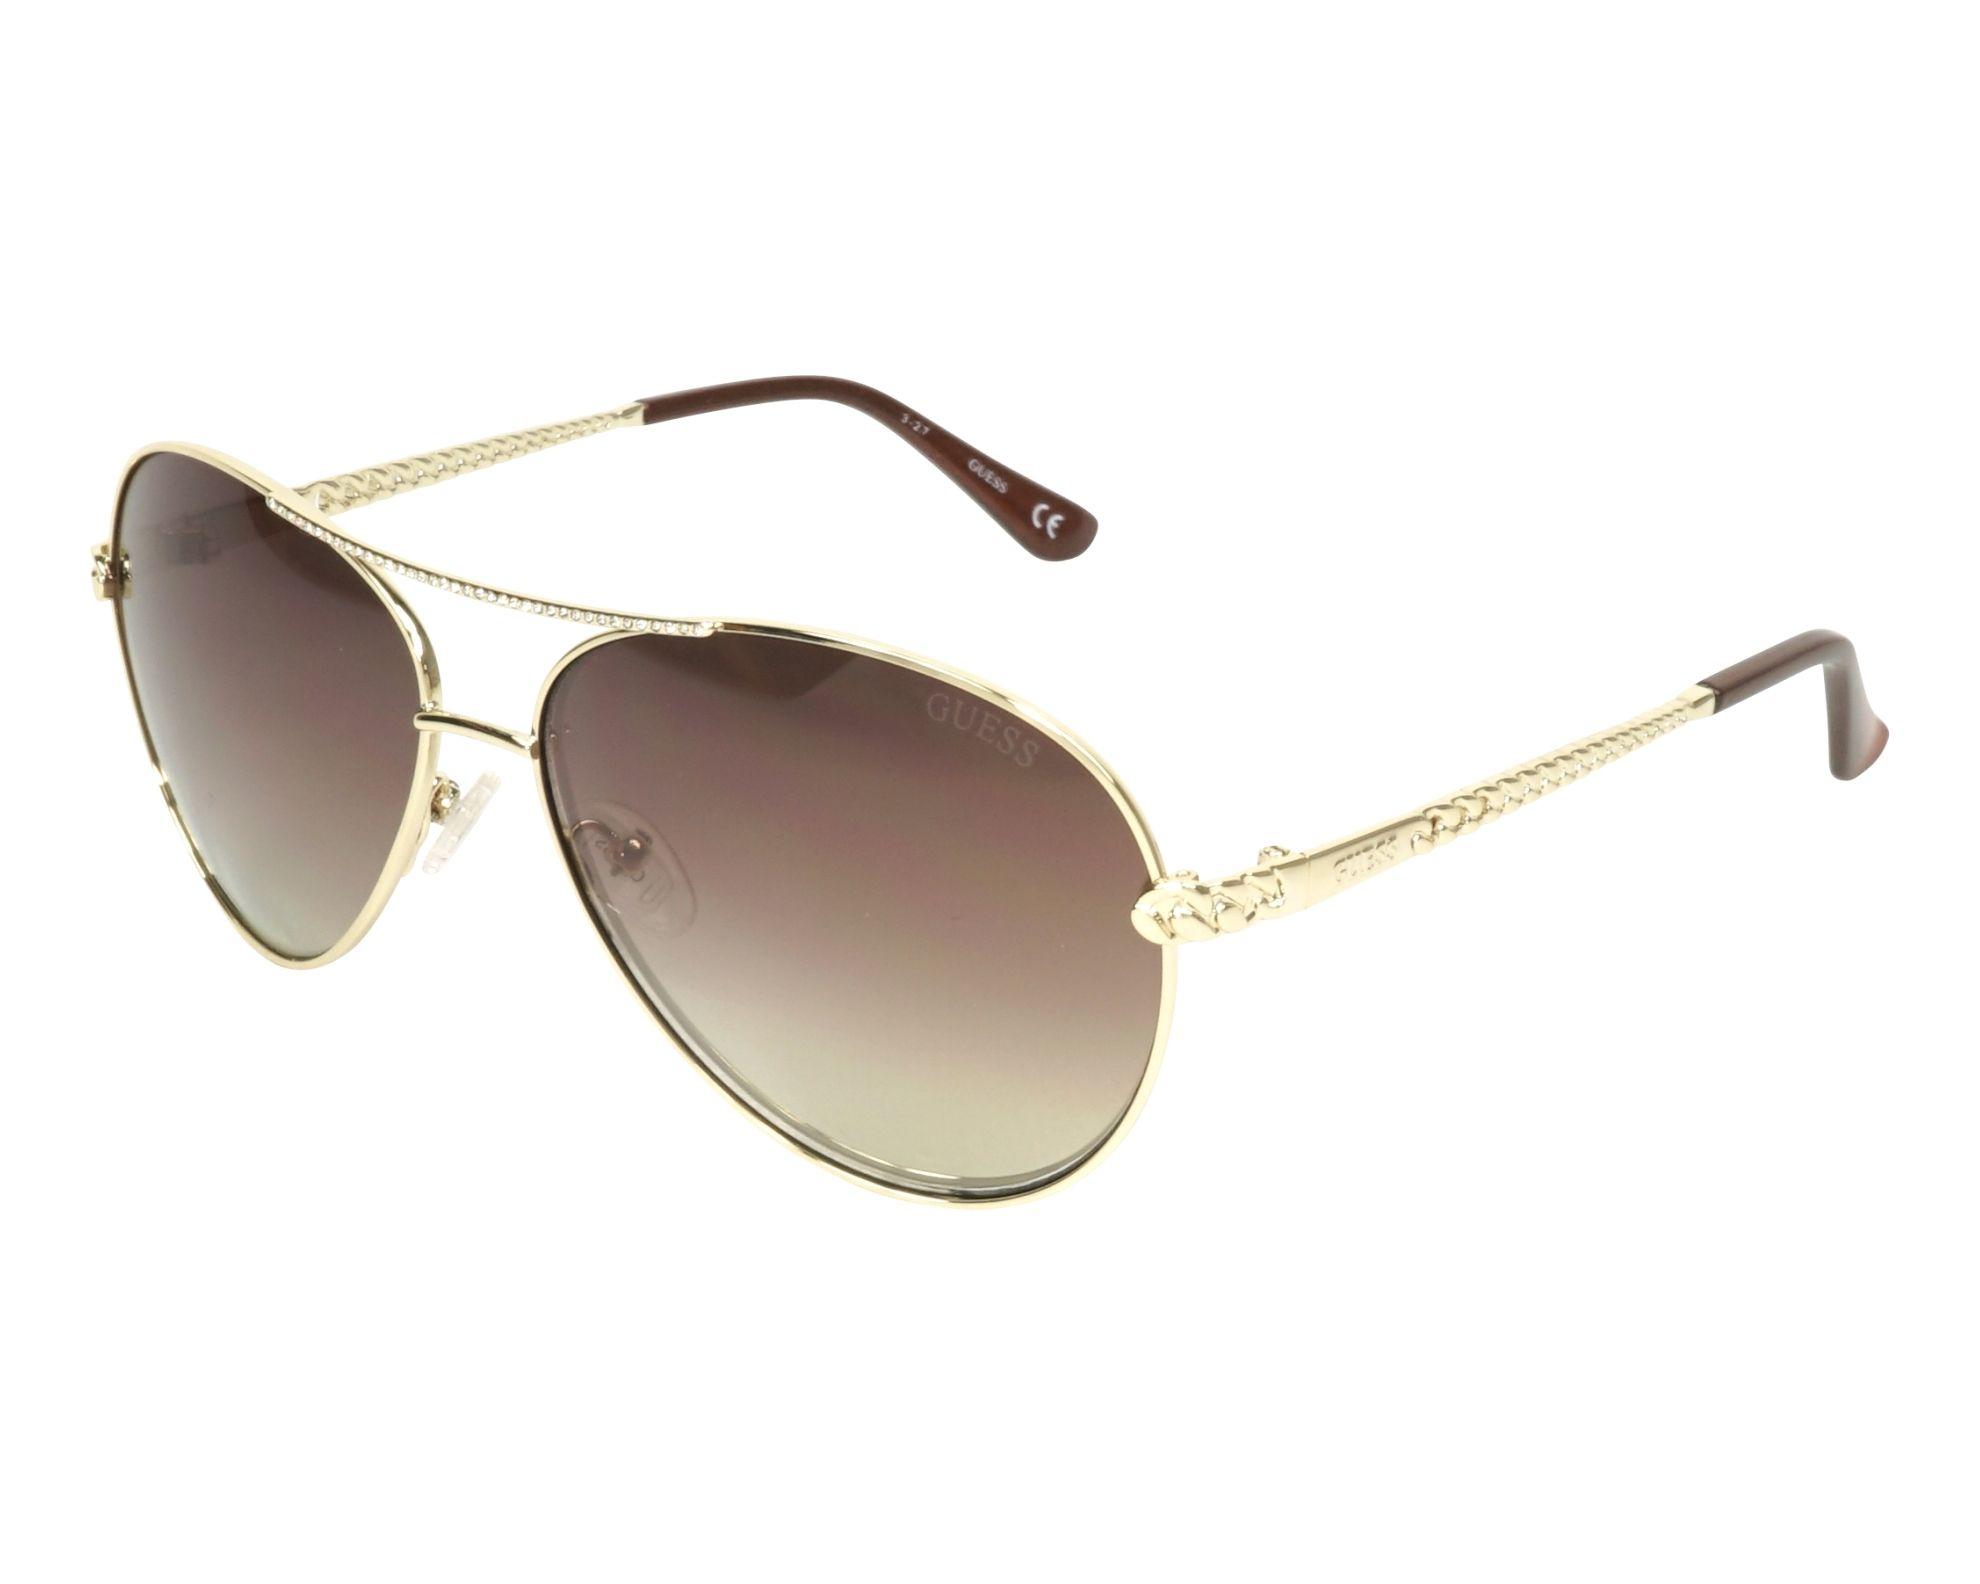 Sunglasses Guess GU-7470-S 32F 60-13 Gold profile view de1872b669d7